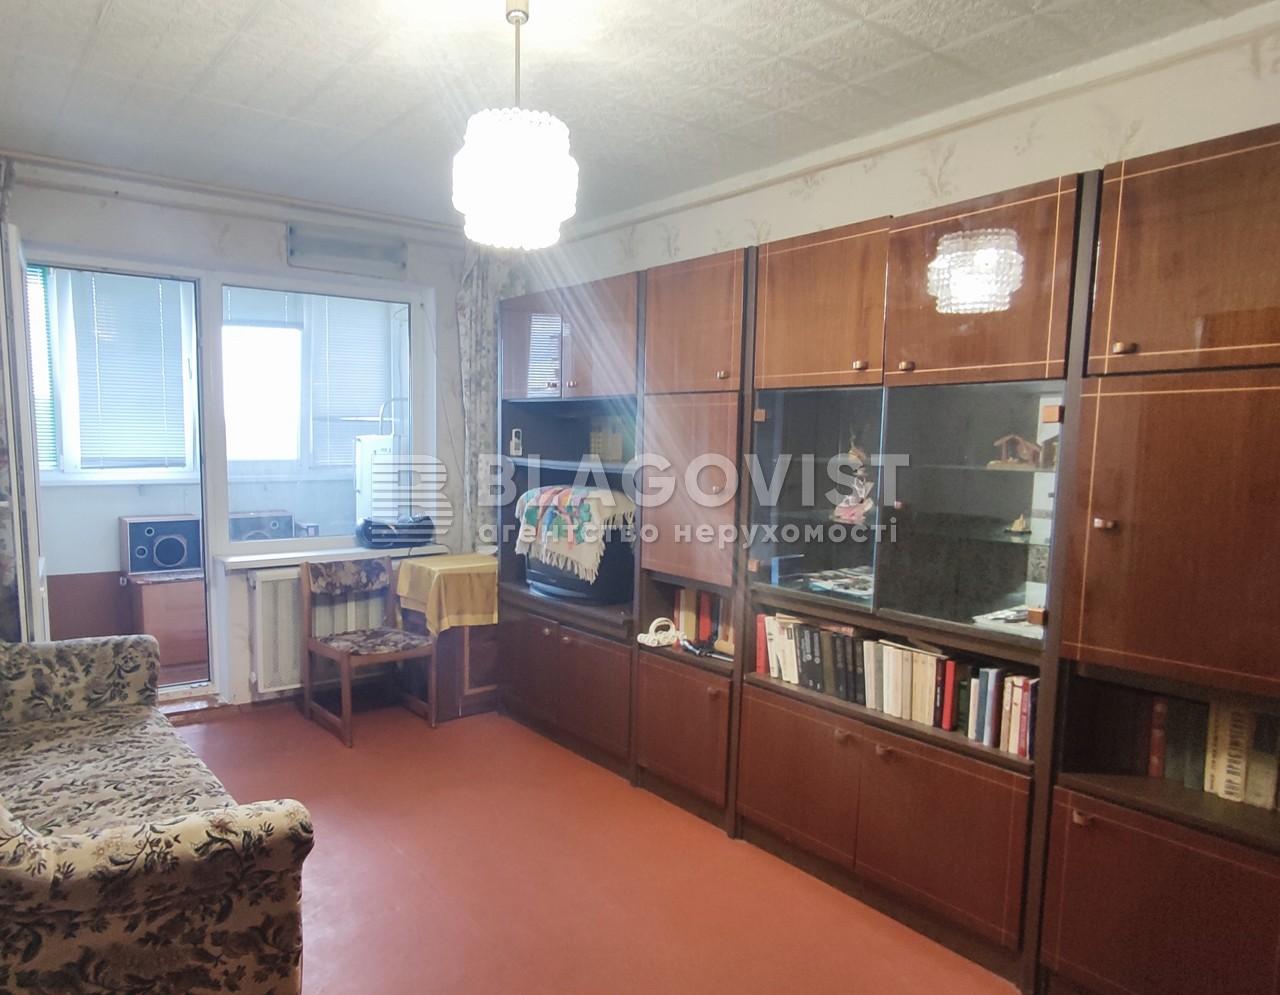 Квартира Z-807904, Приречная, 17, Киев - Фото 6